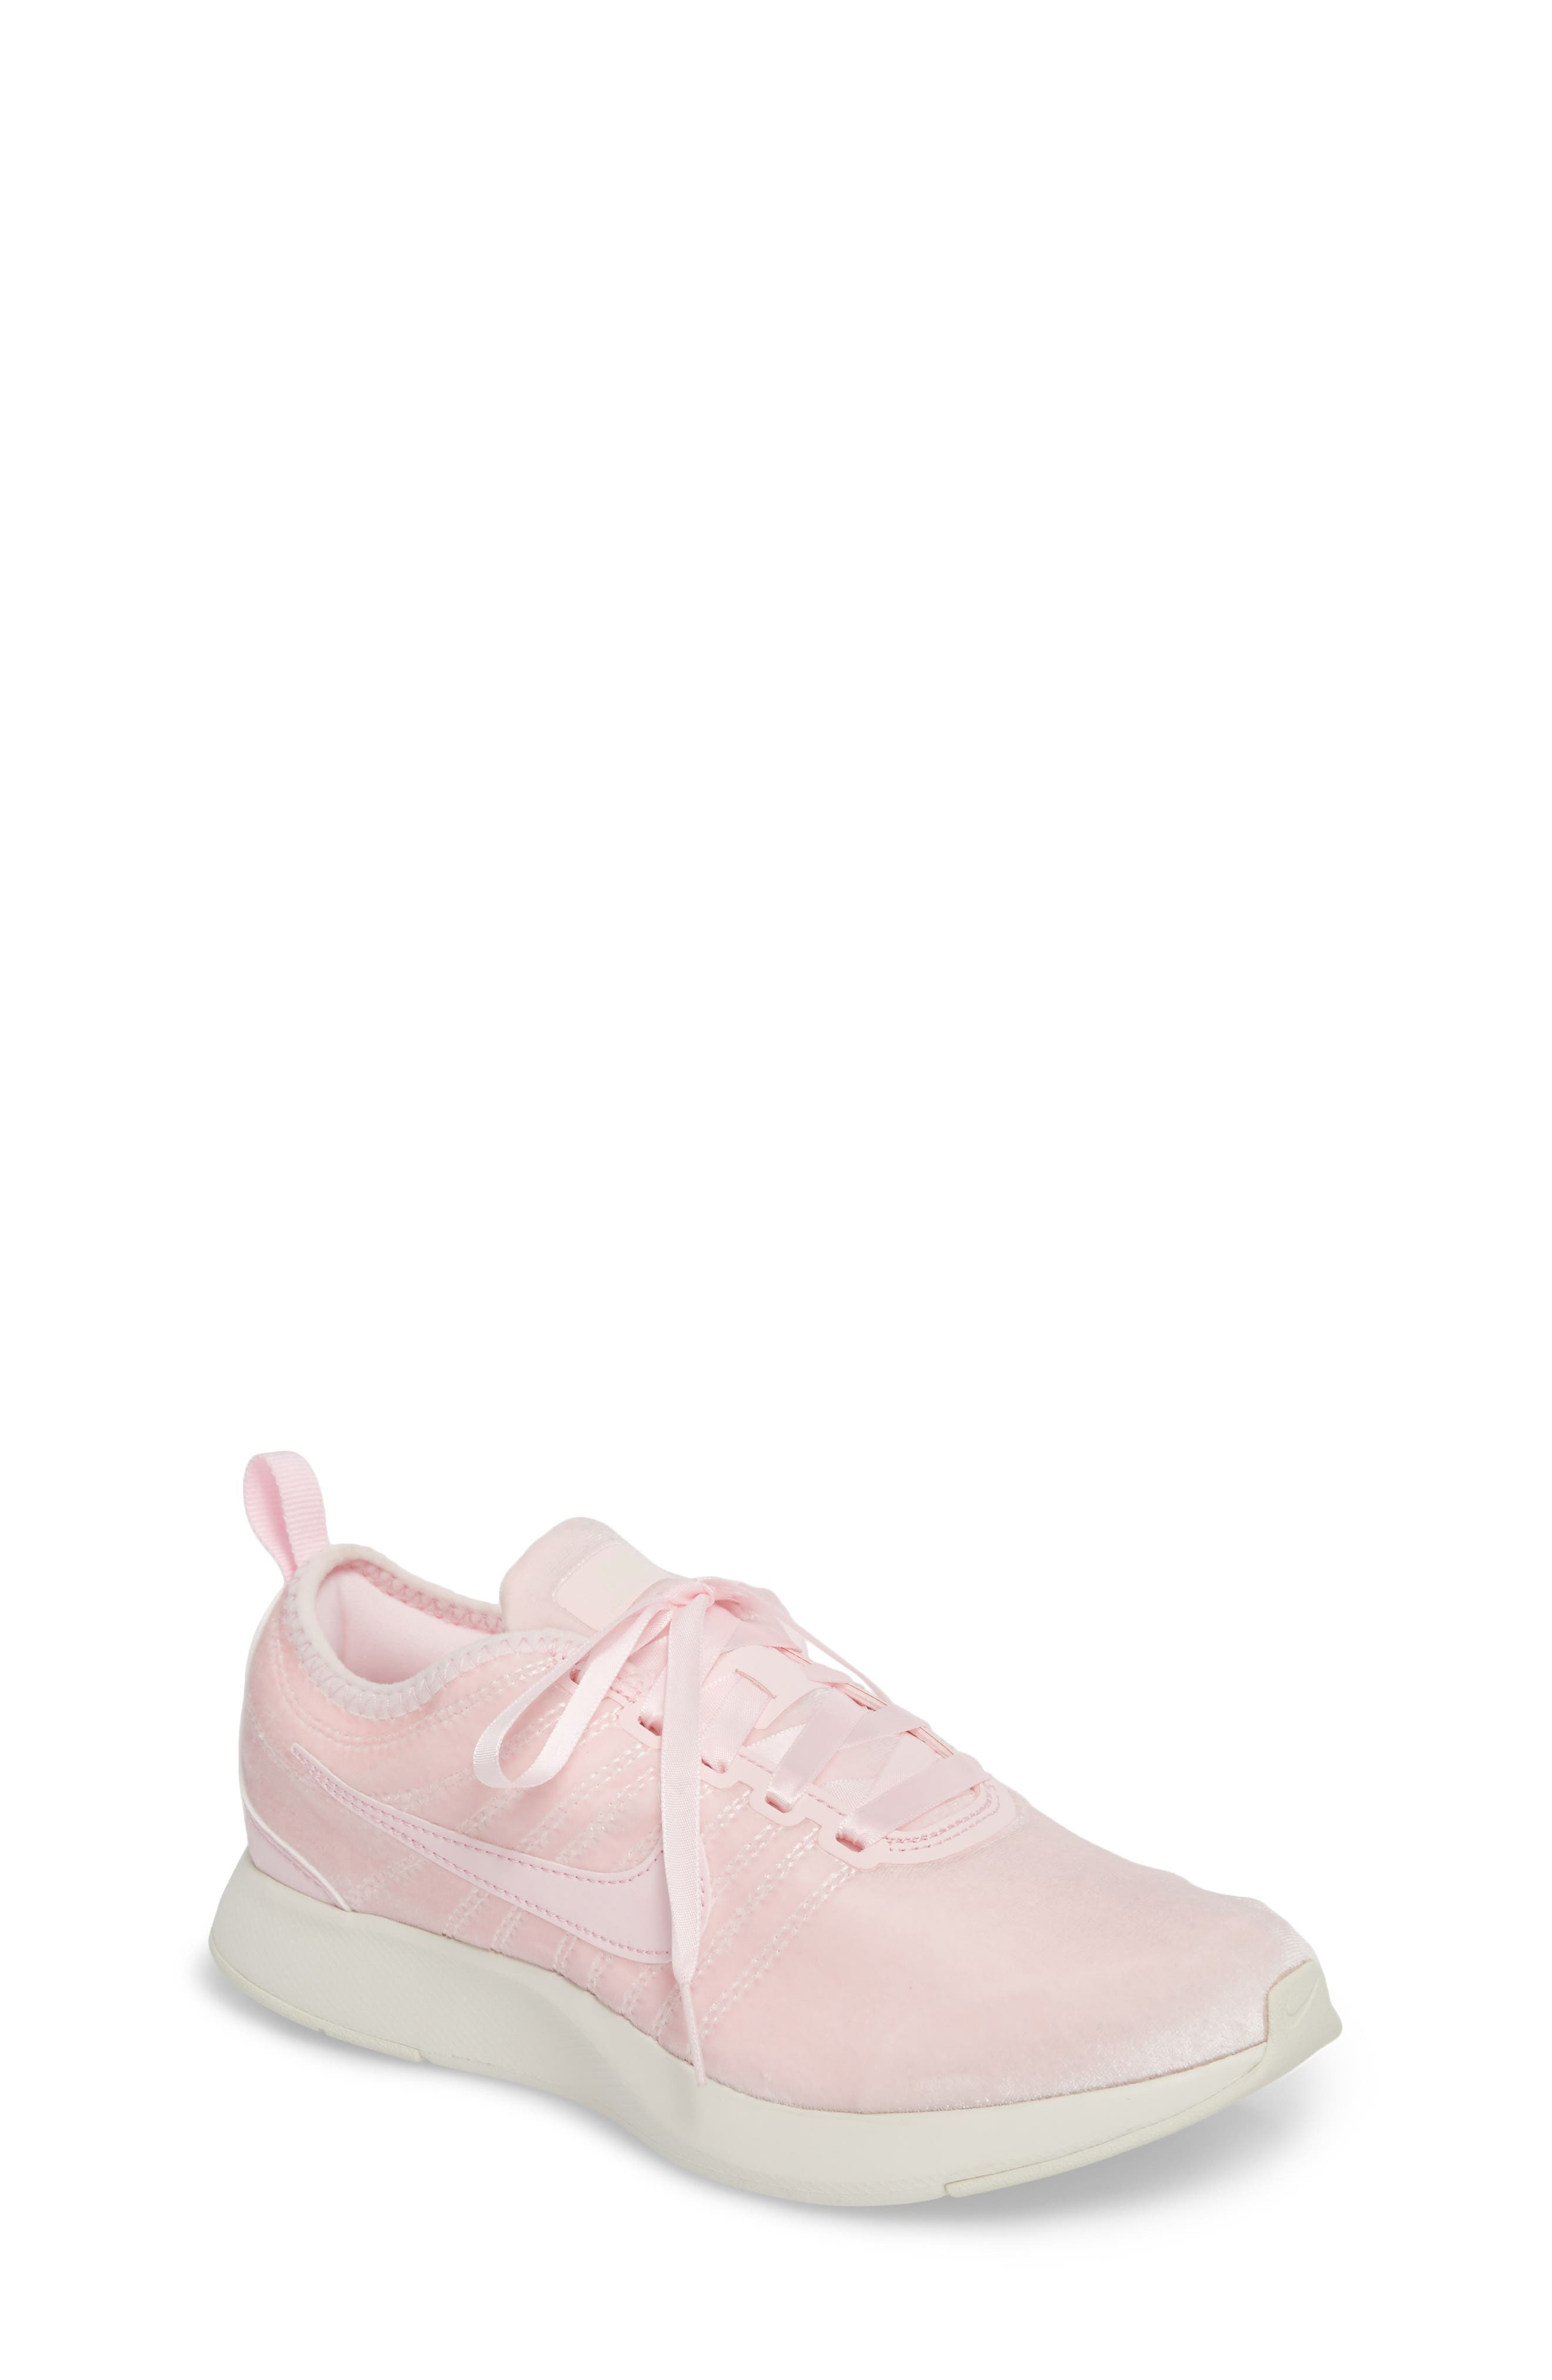 Dualtone Racer SE Sneaker,                         Main,                         color, 650